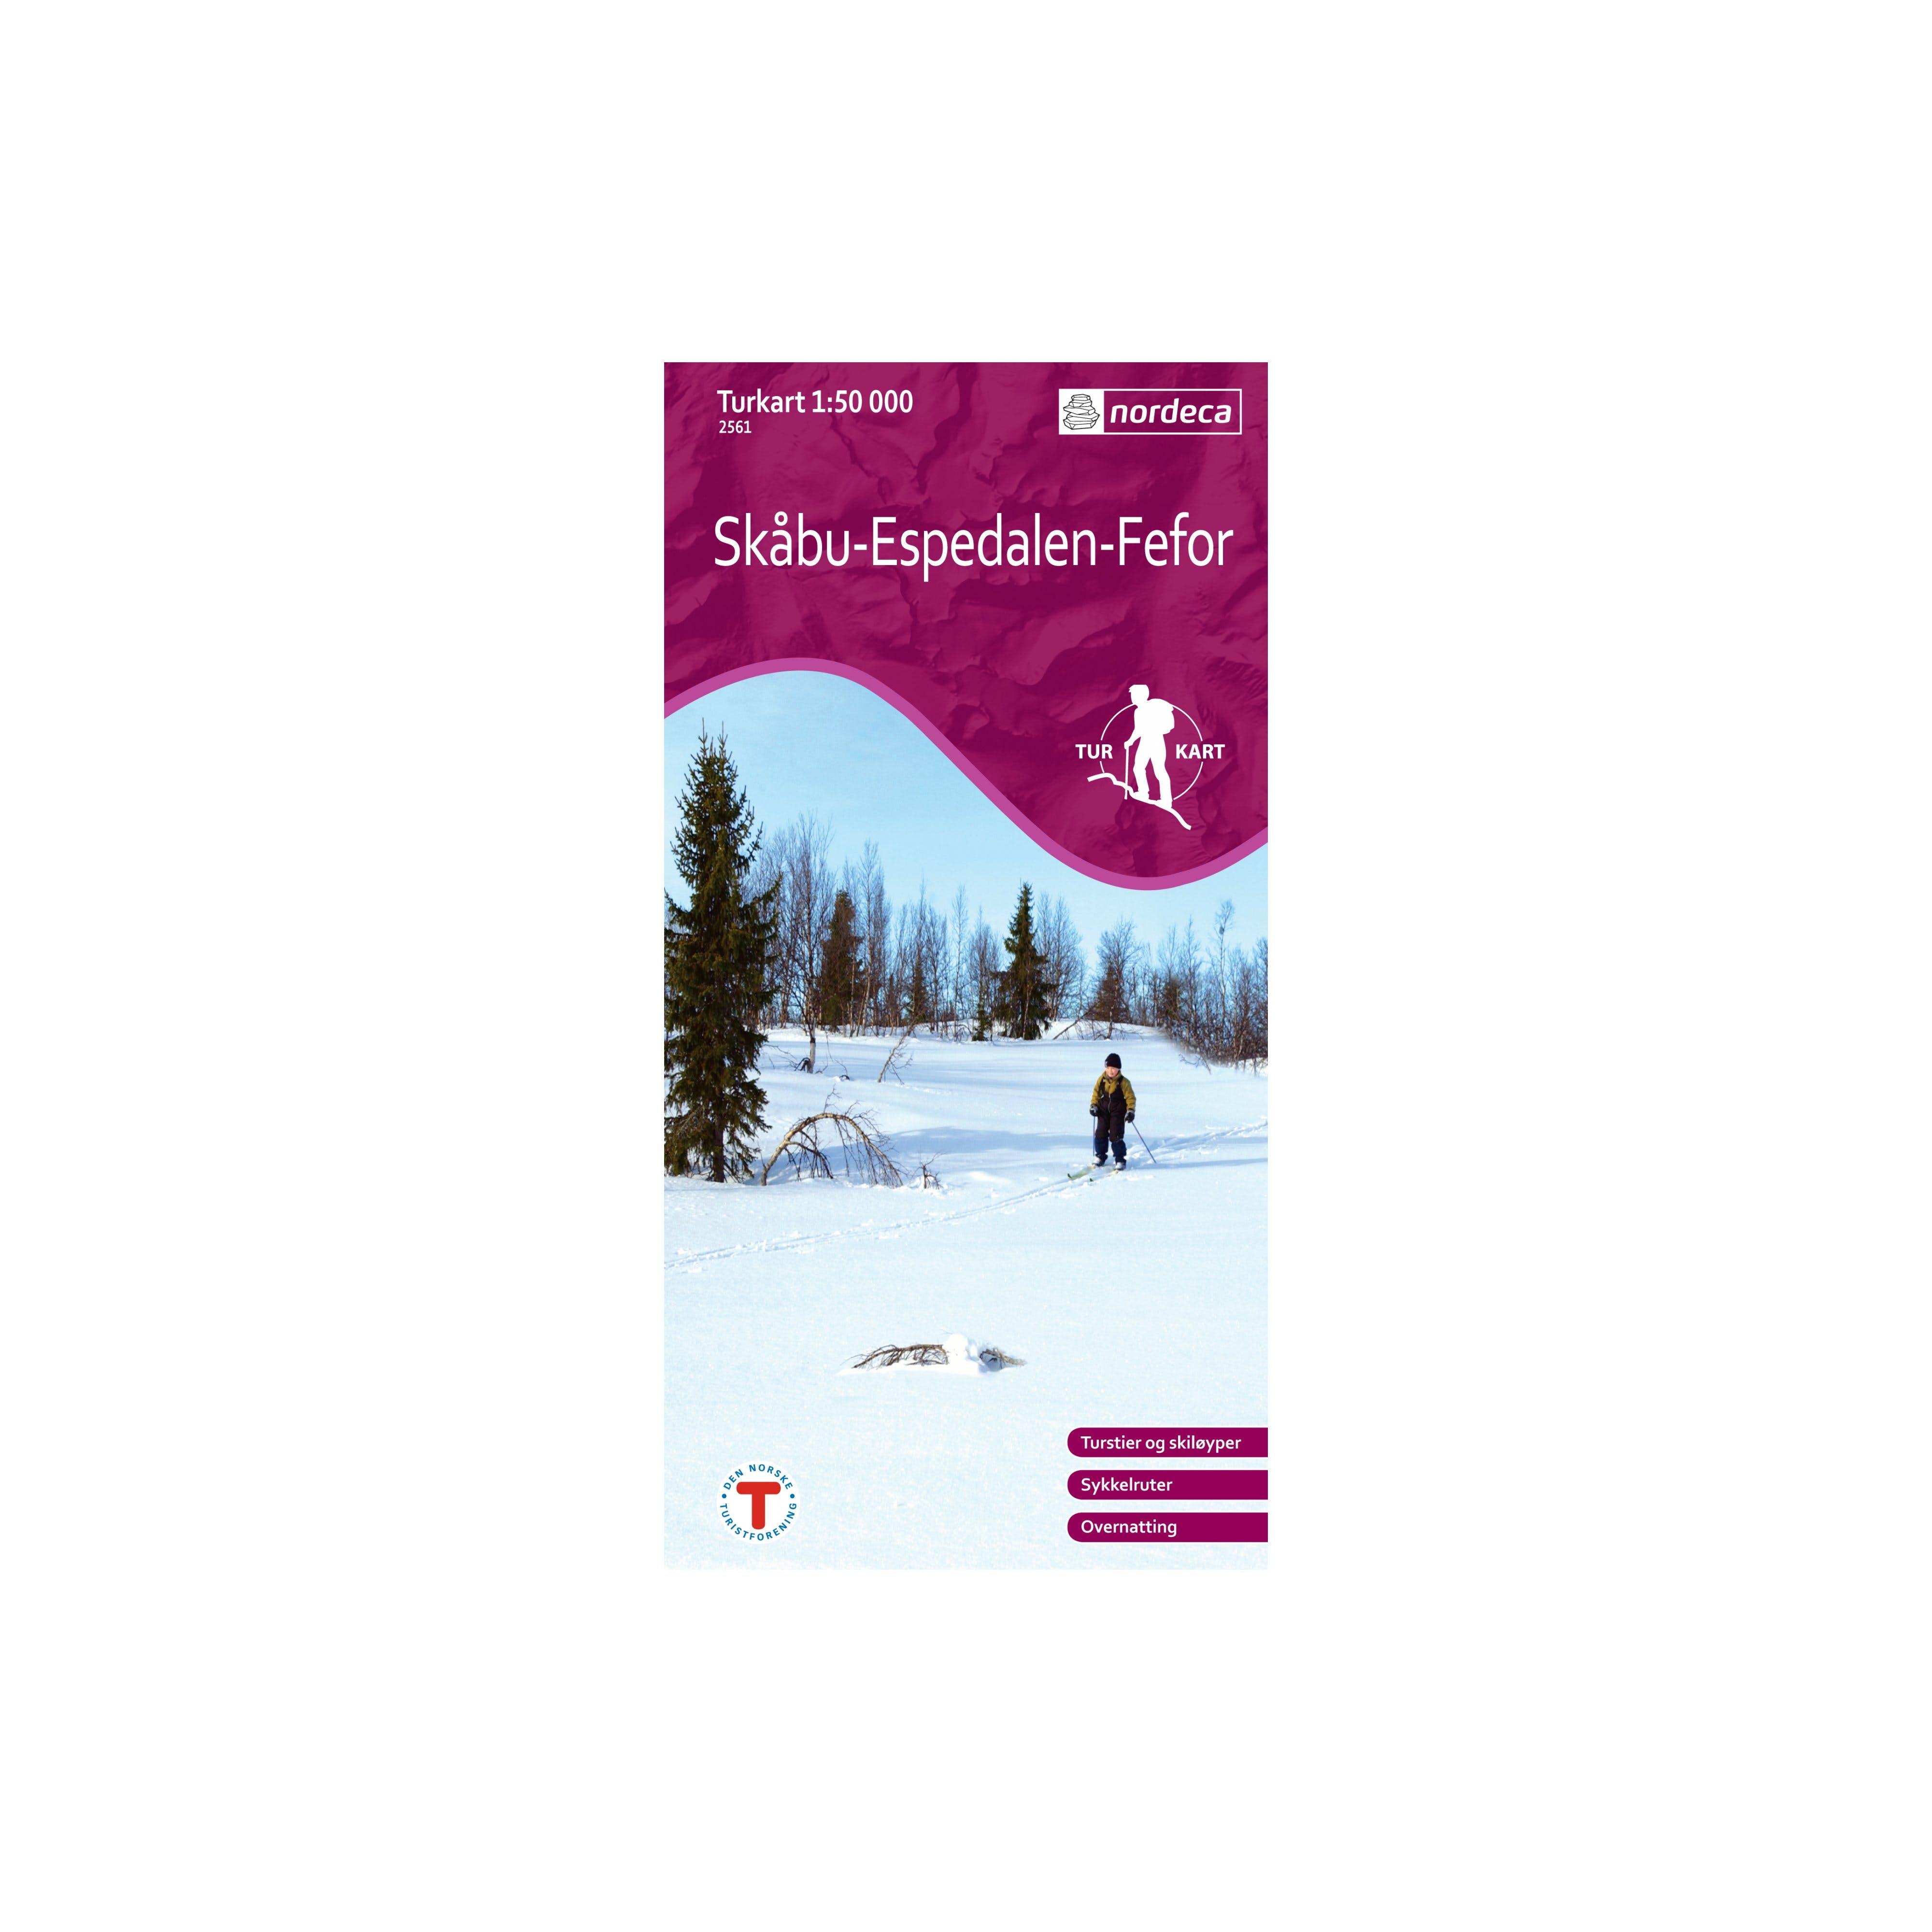 Skabu Espedalen Fefor 1 50 000 Lillehammer Sport